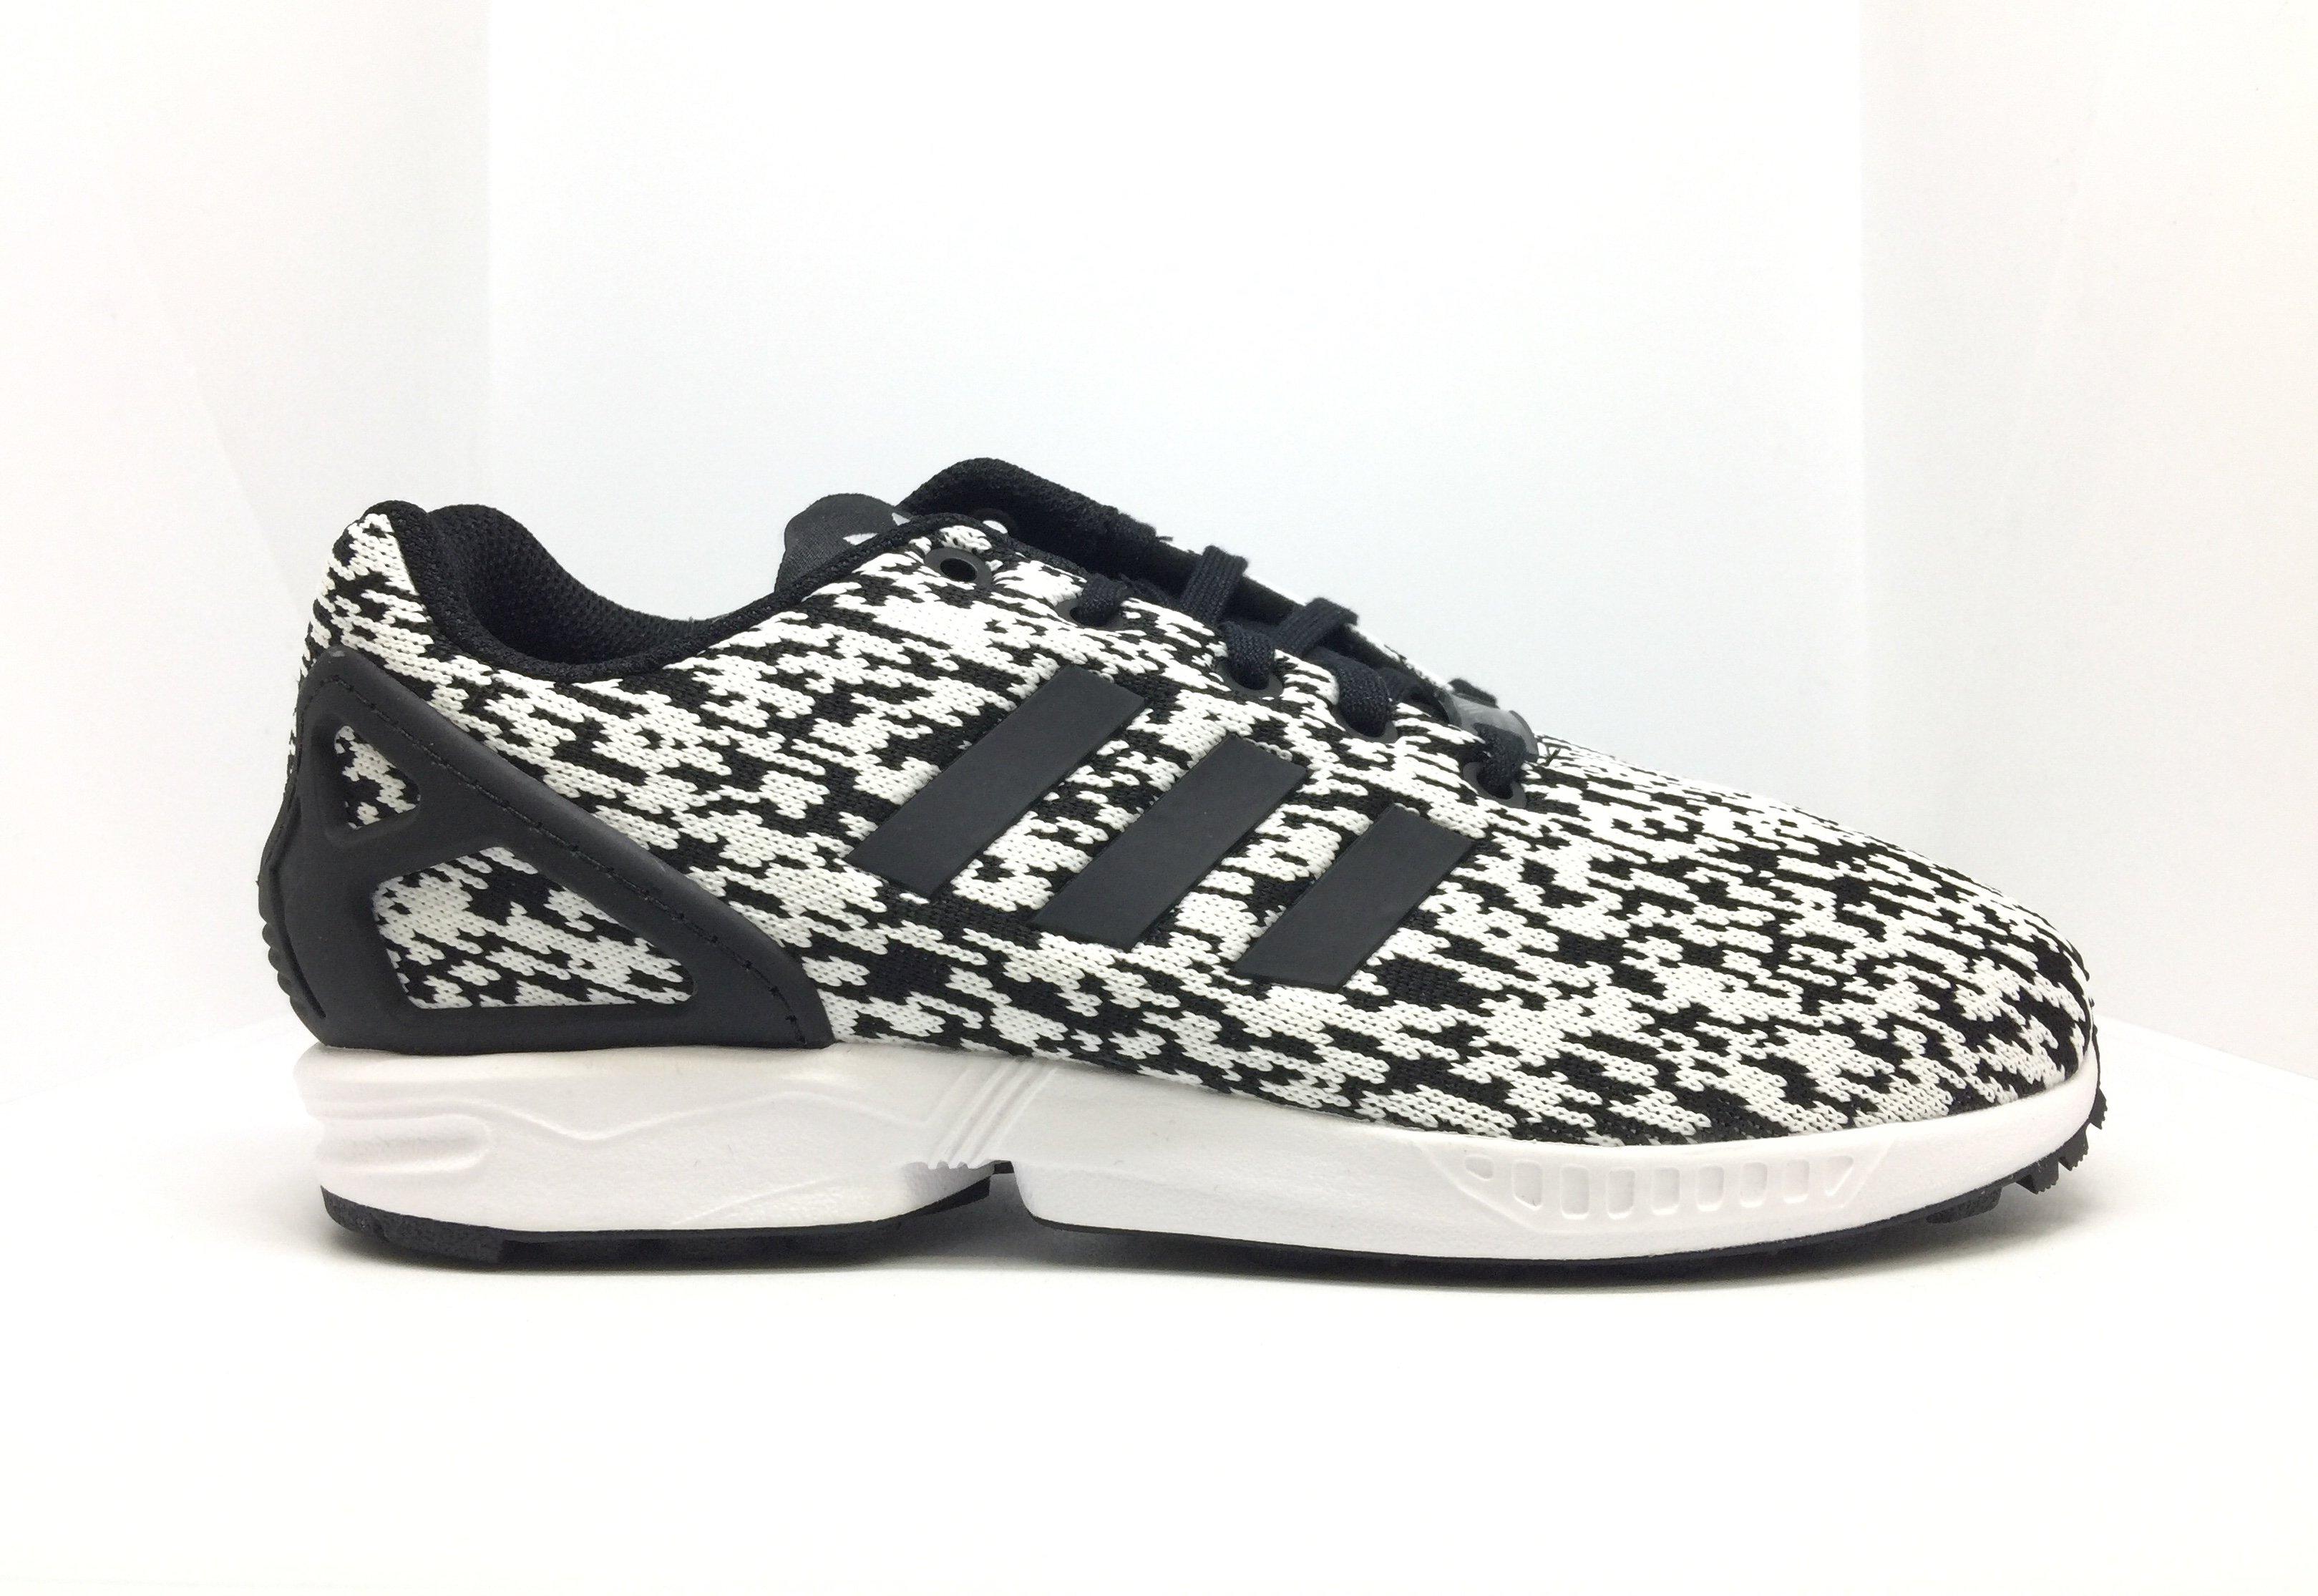 size 40 ffcb2 e42ec ADIDAS ZX FLUX J Scarpe da Donna Sneaker Scarpe Da Ginnastica Originals  Nero Bianco by9829